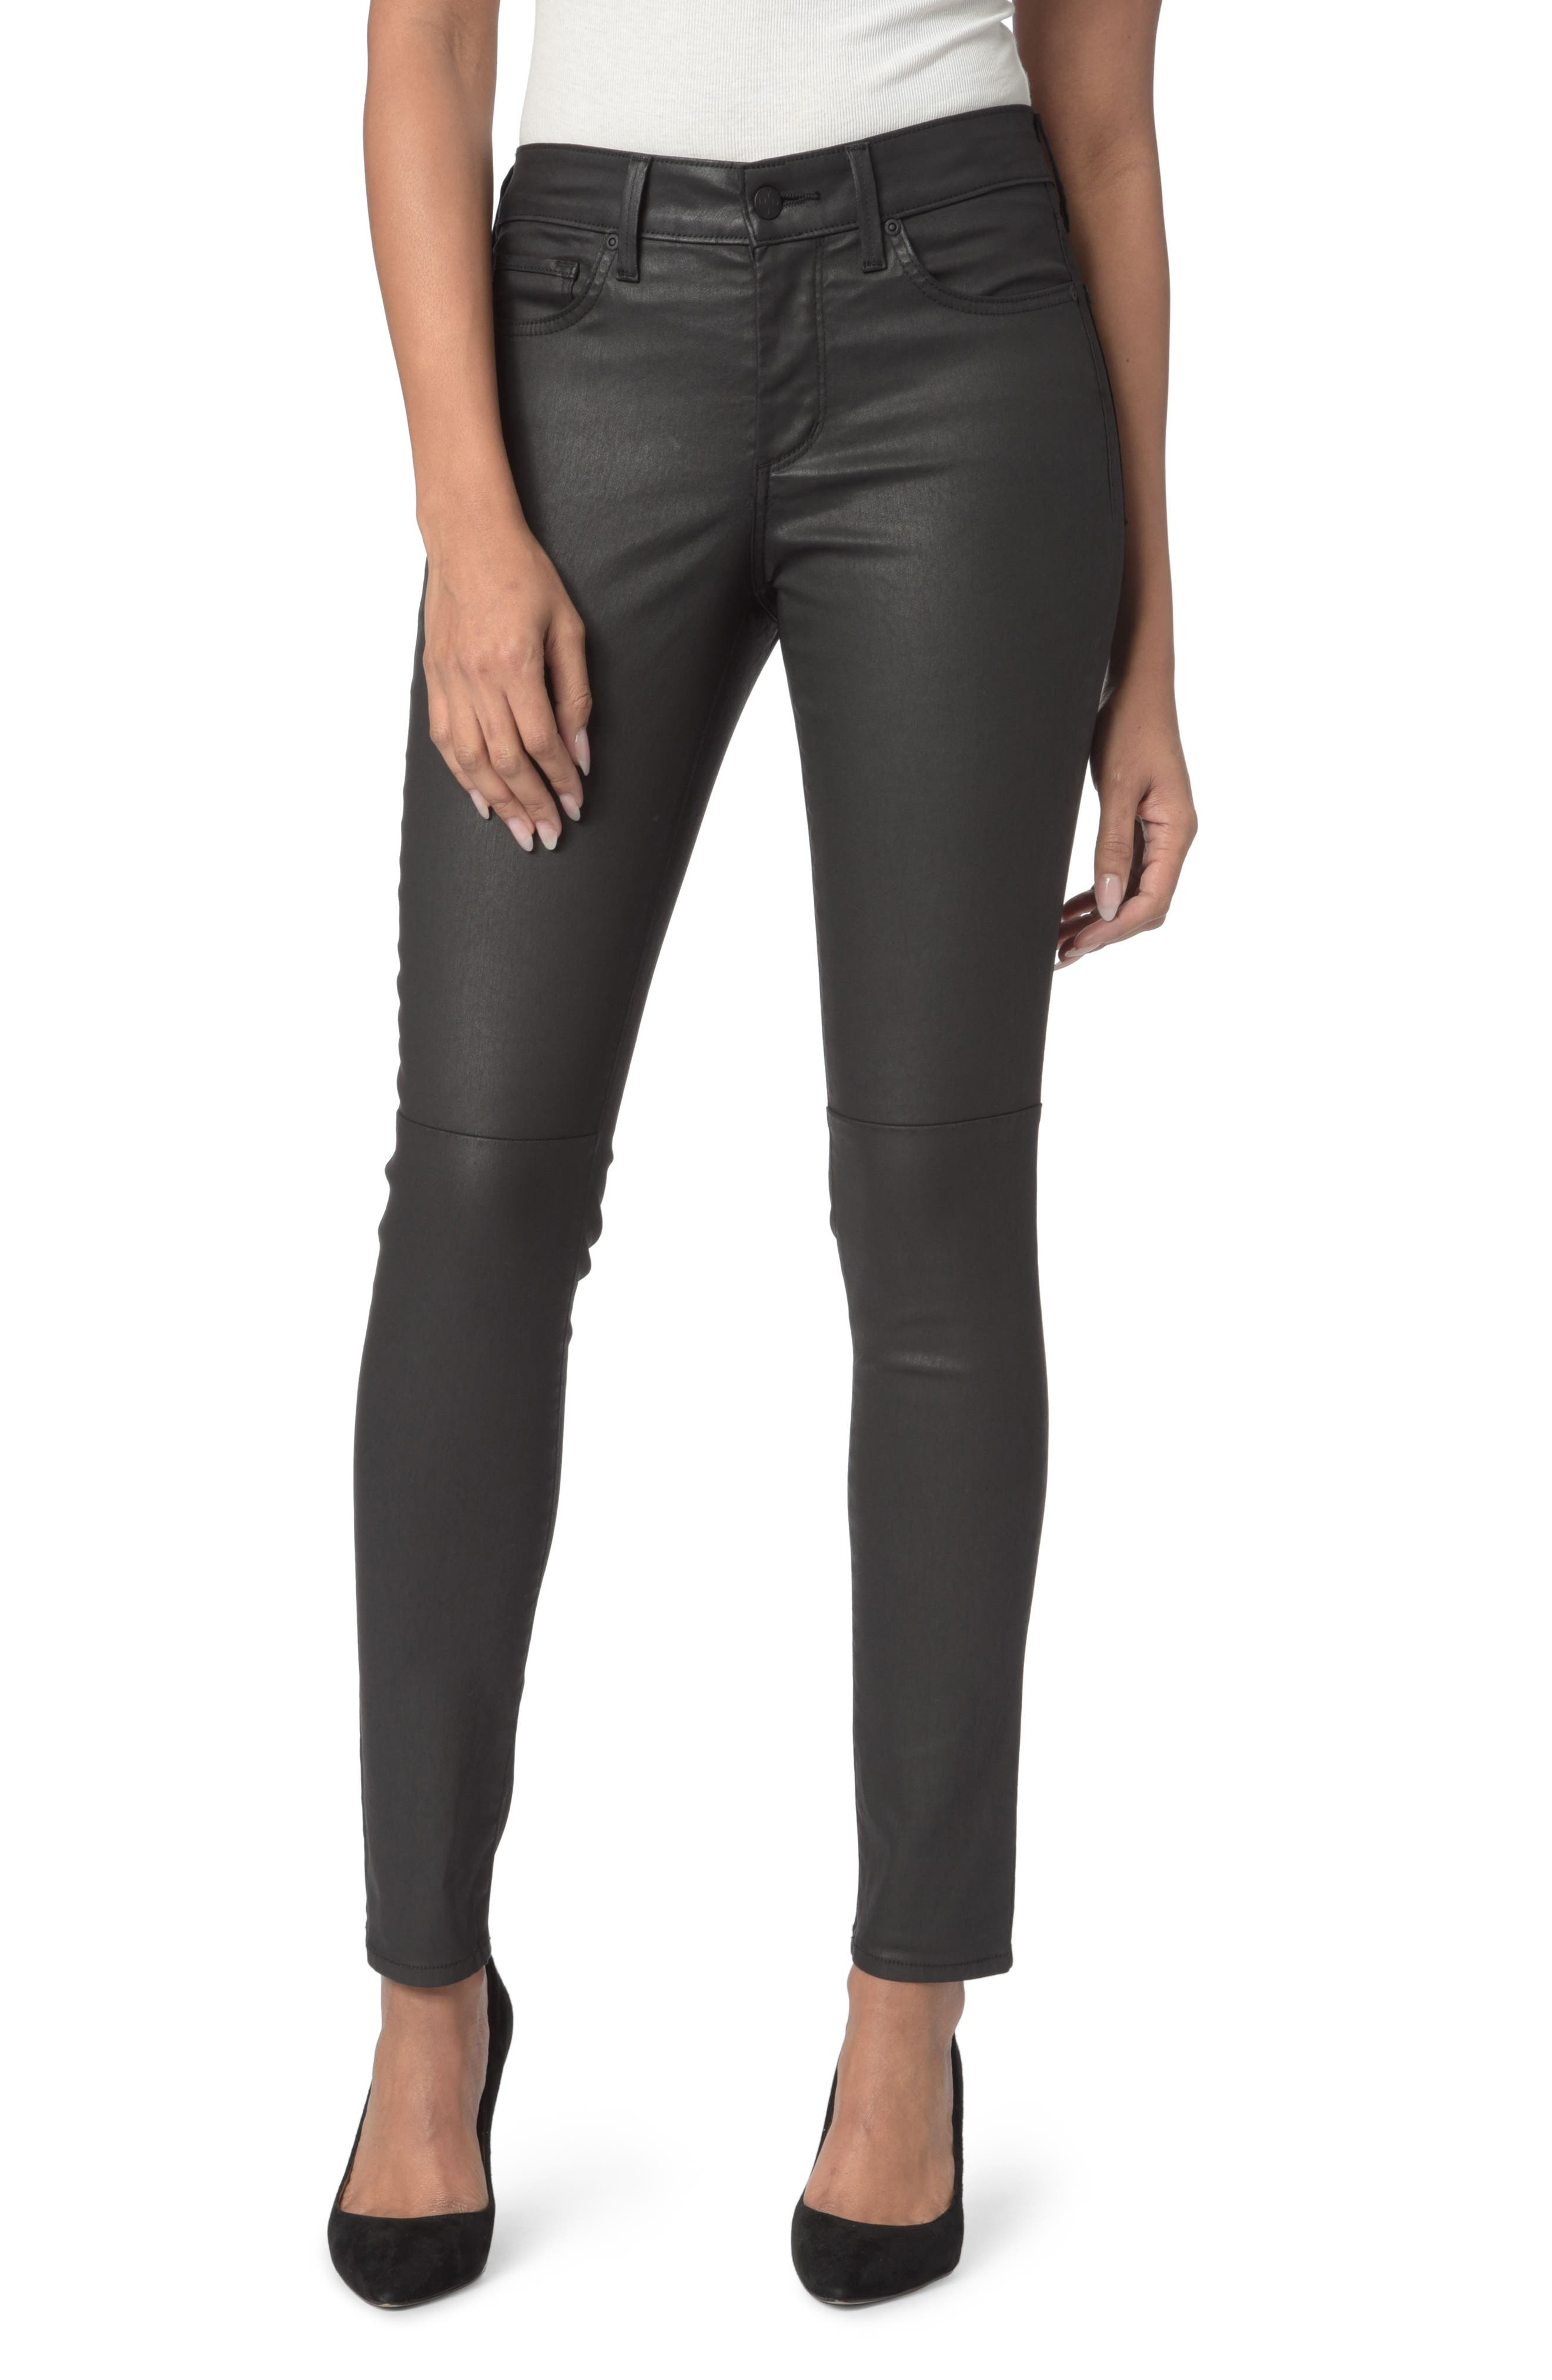 Alternate Image 1 Selected - NYDJ Coated Stretch Skinny Jeans (Regular & Petite)